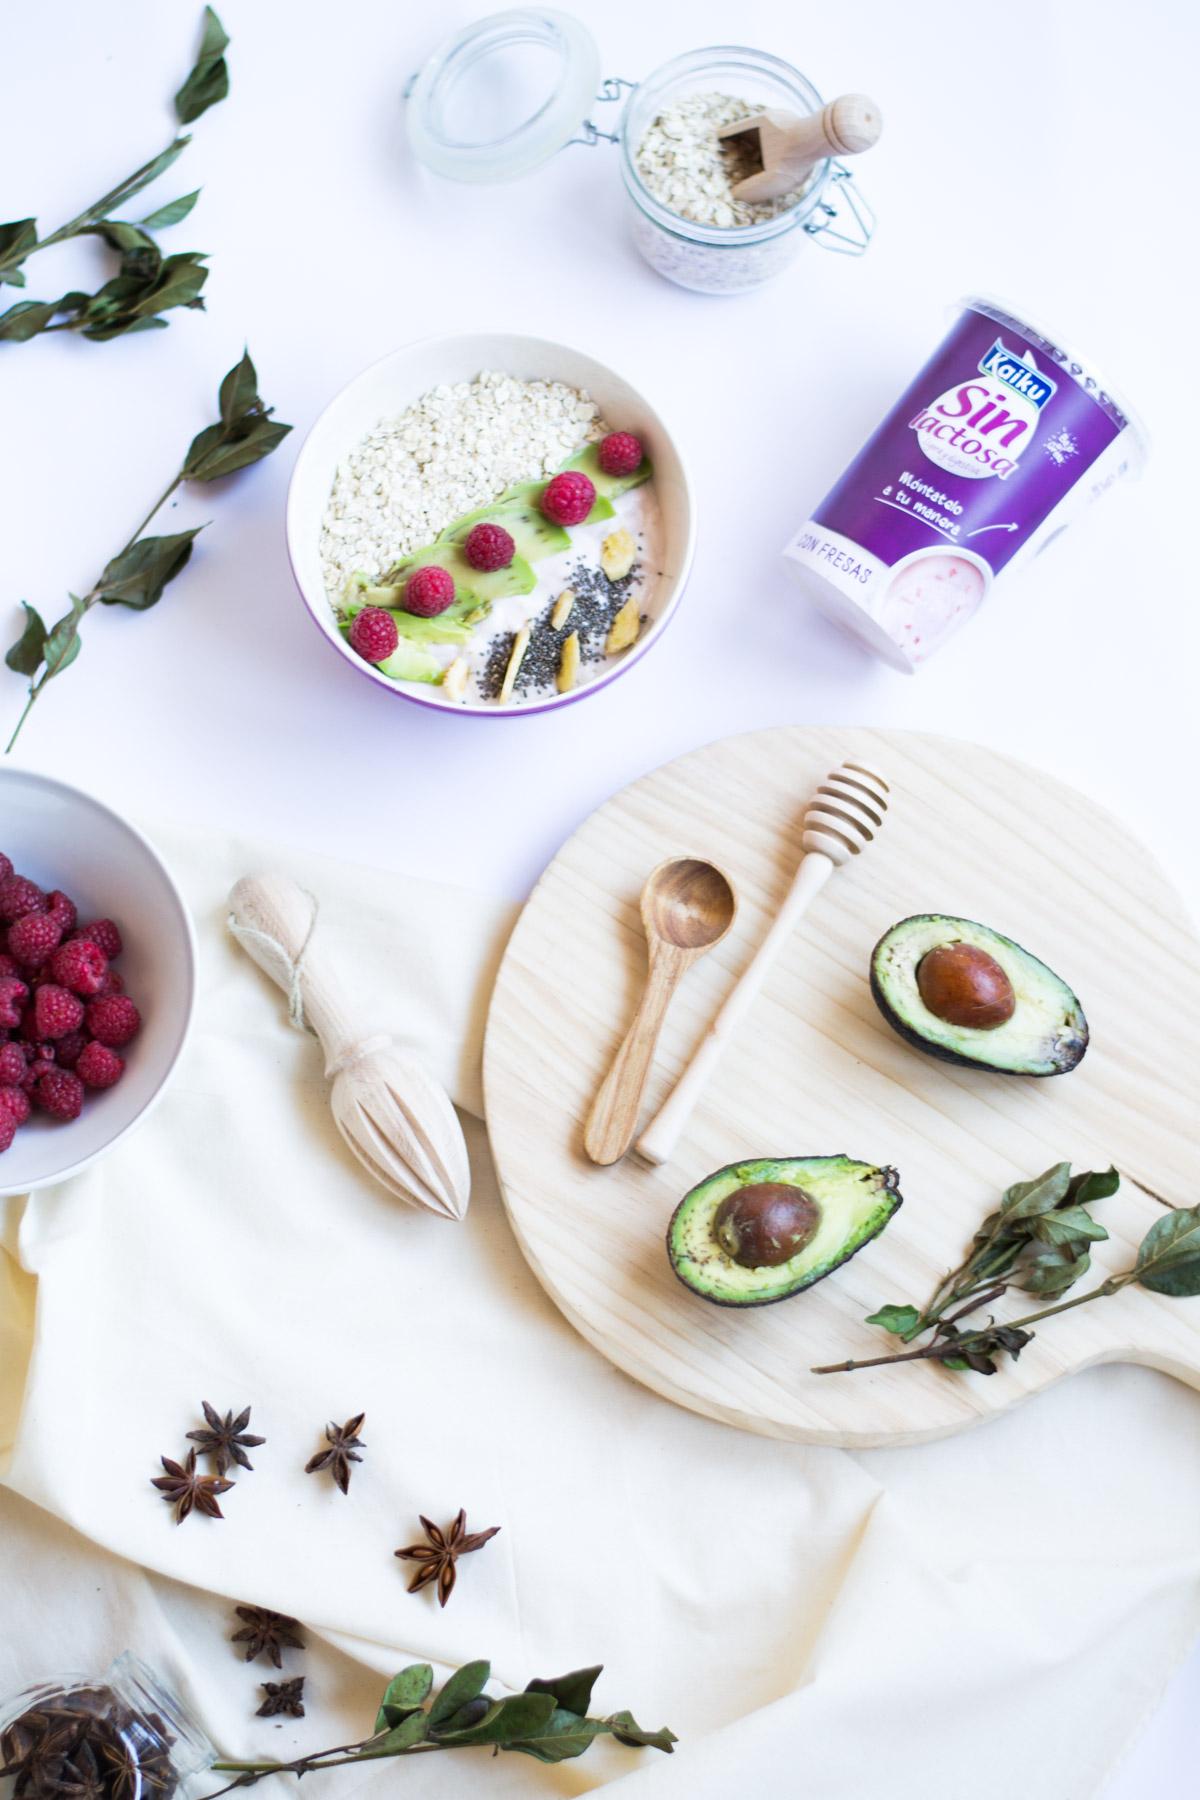 kaiku-sin-lactosa-como-comer-sano-receta-smoothie-bowl